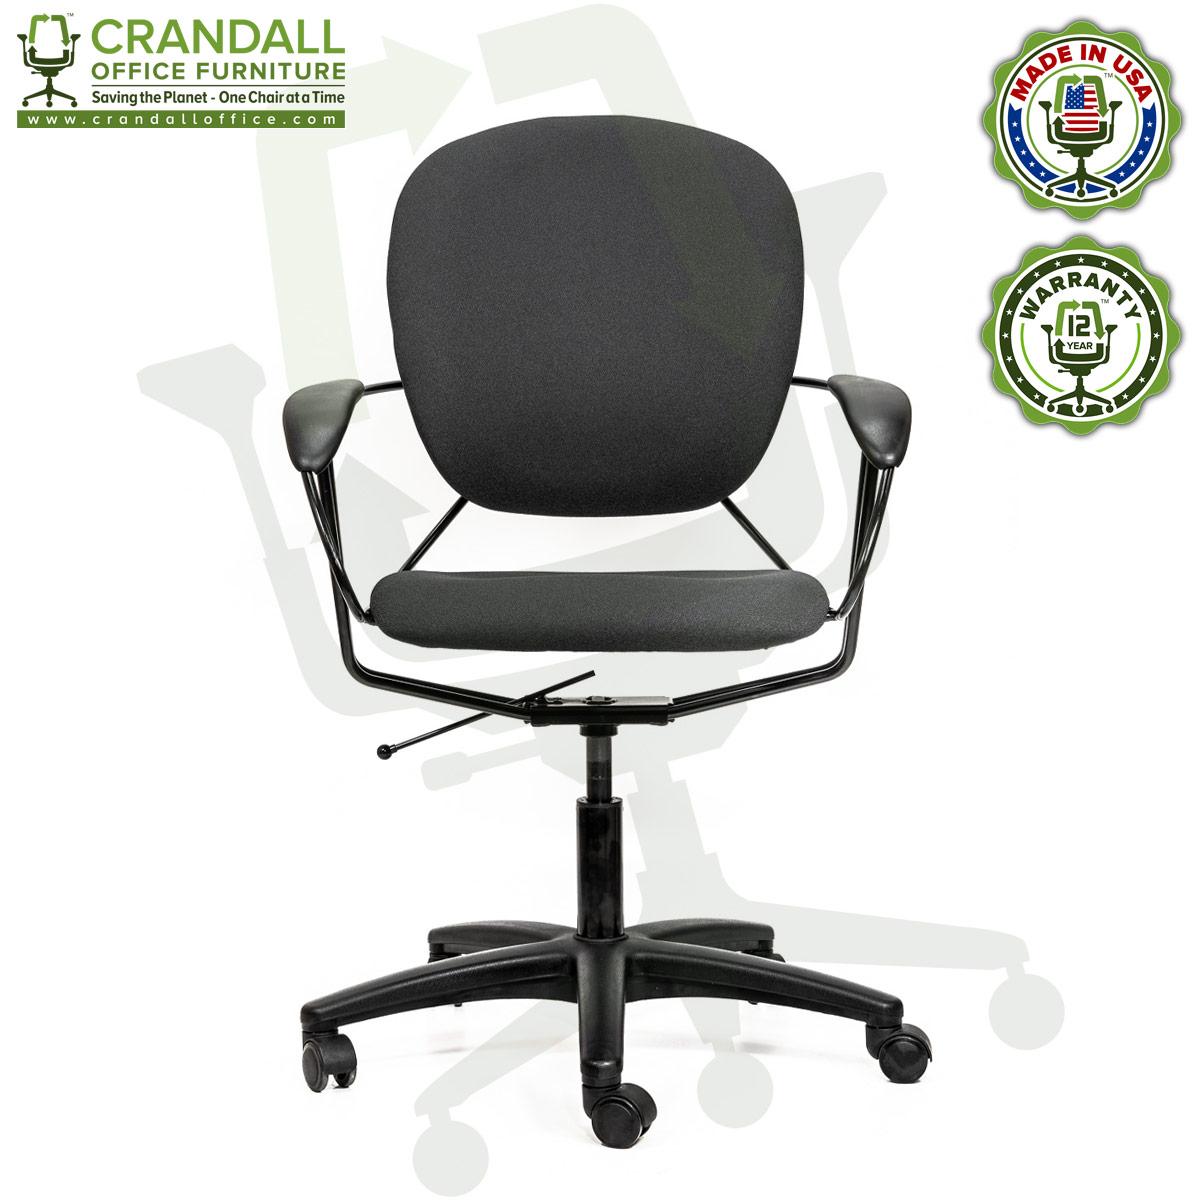 Remanufactured Steelcase Turnstone TS311 Uno Chair - 01